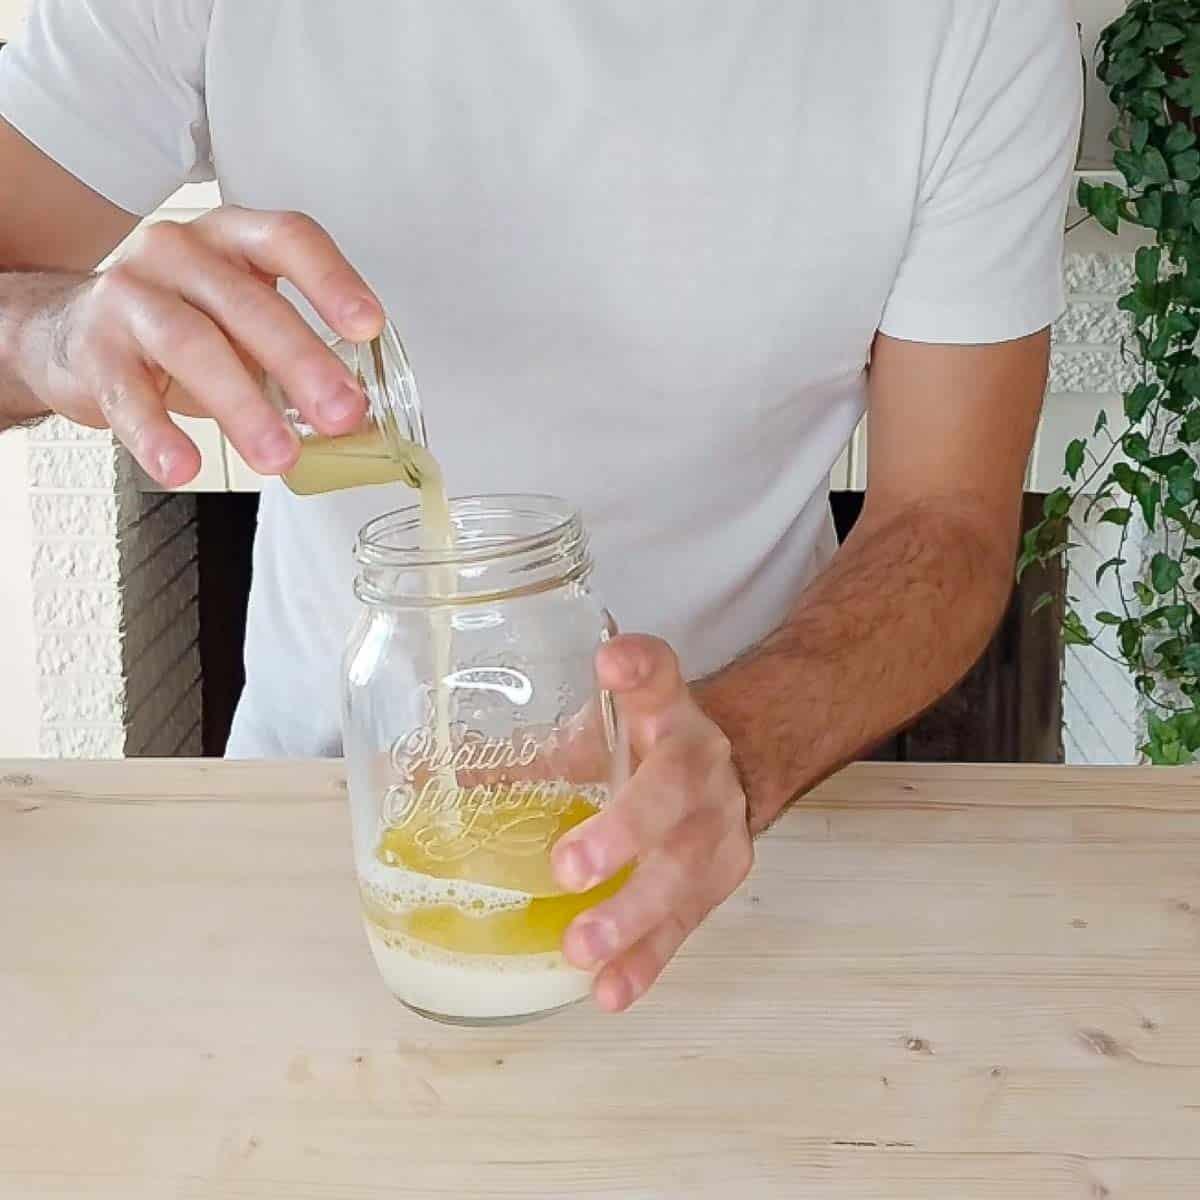 put all ingredients in mason jar